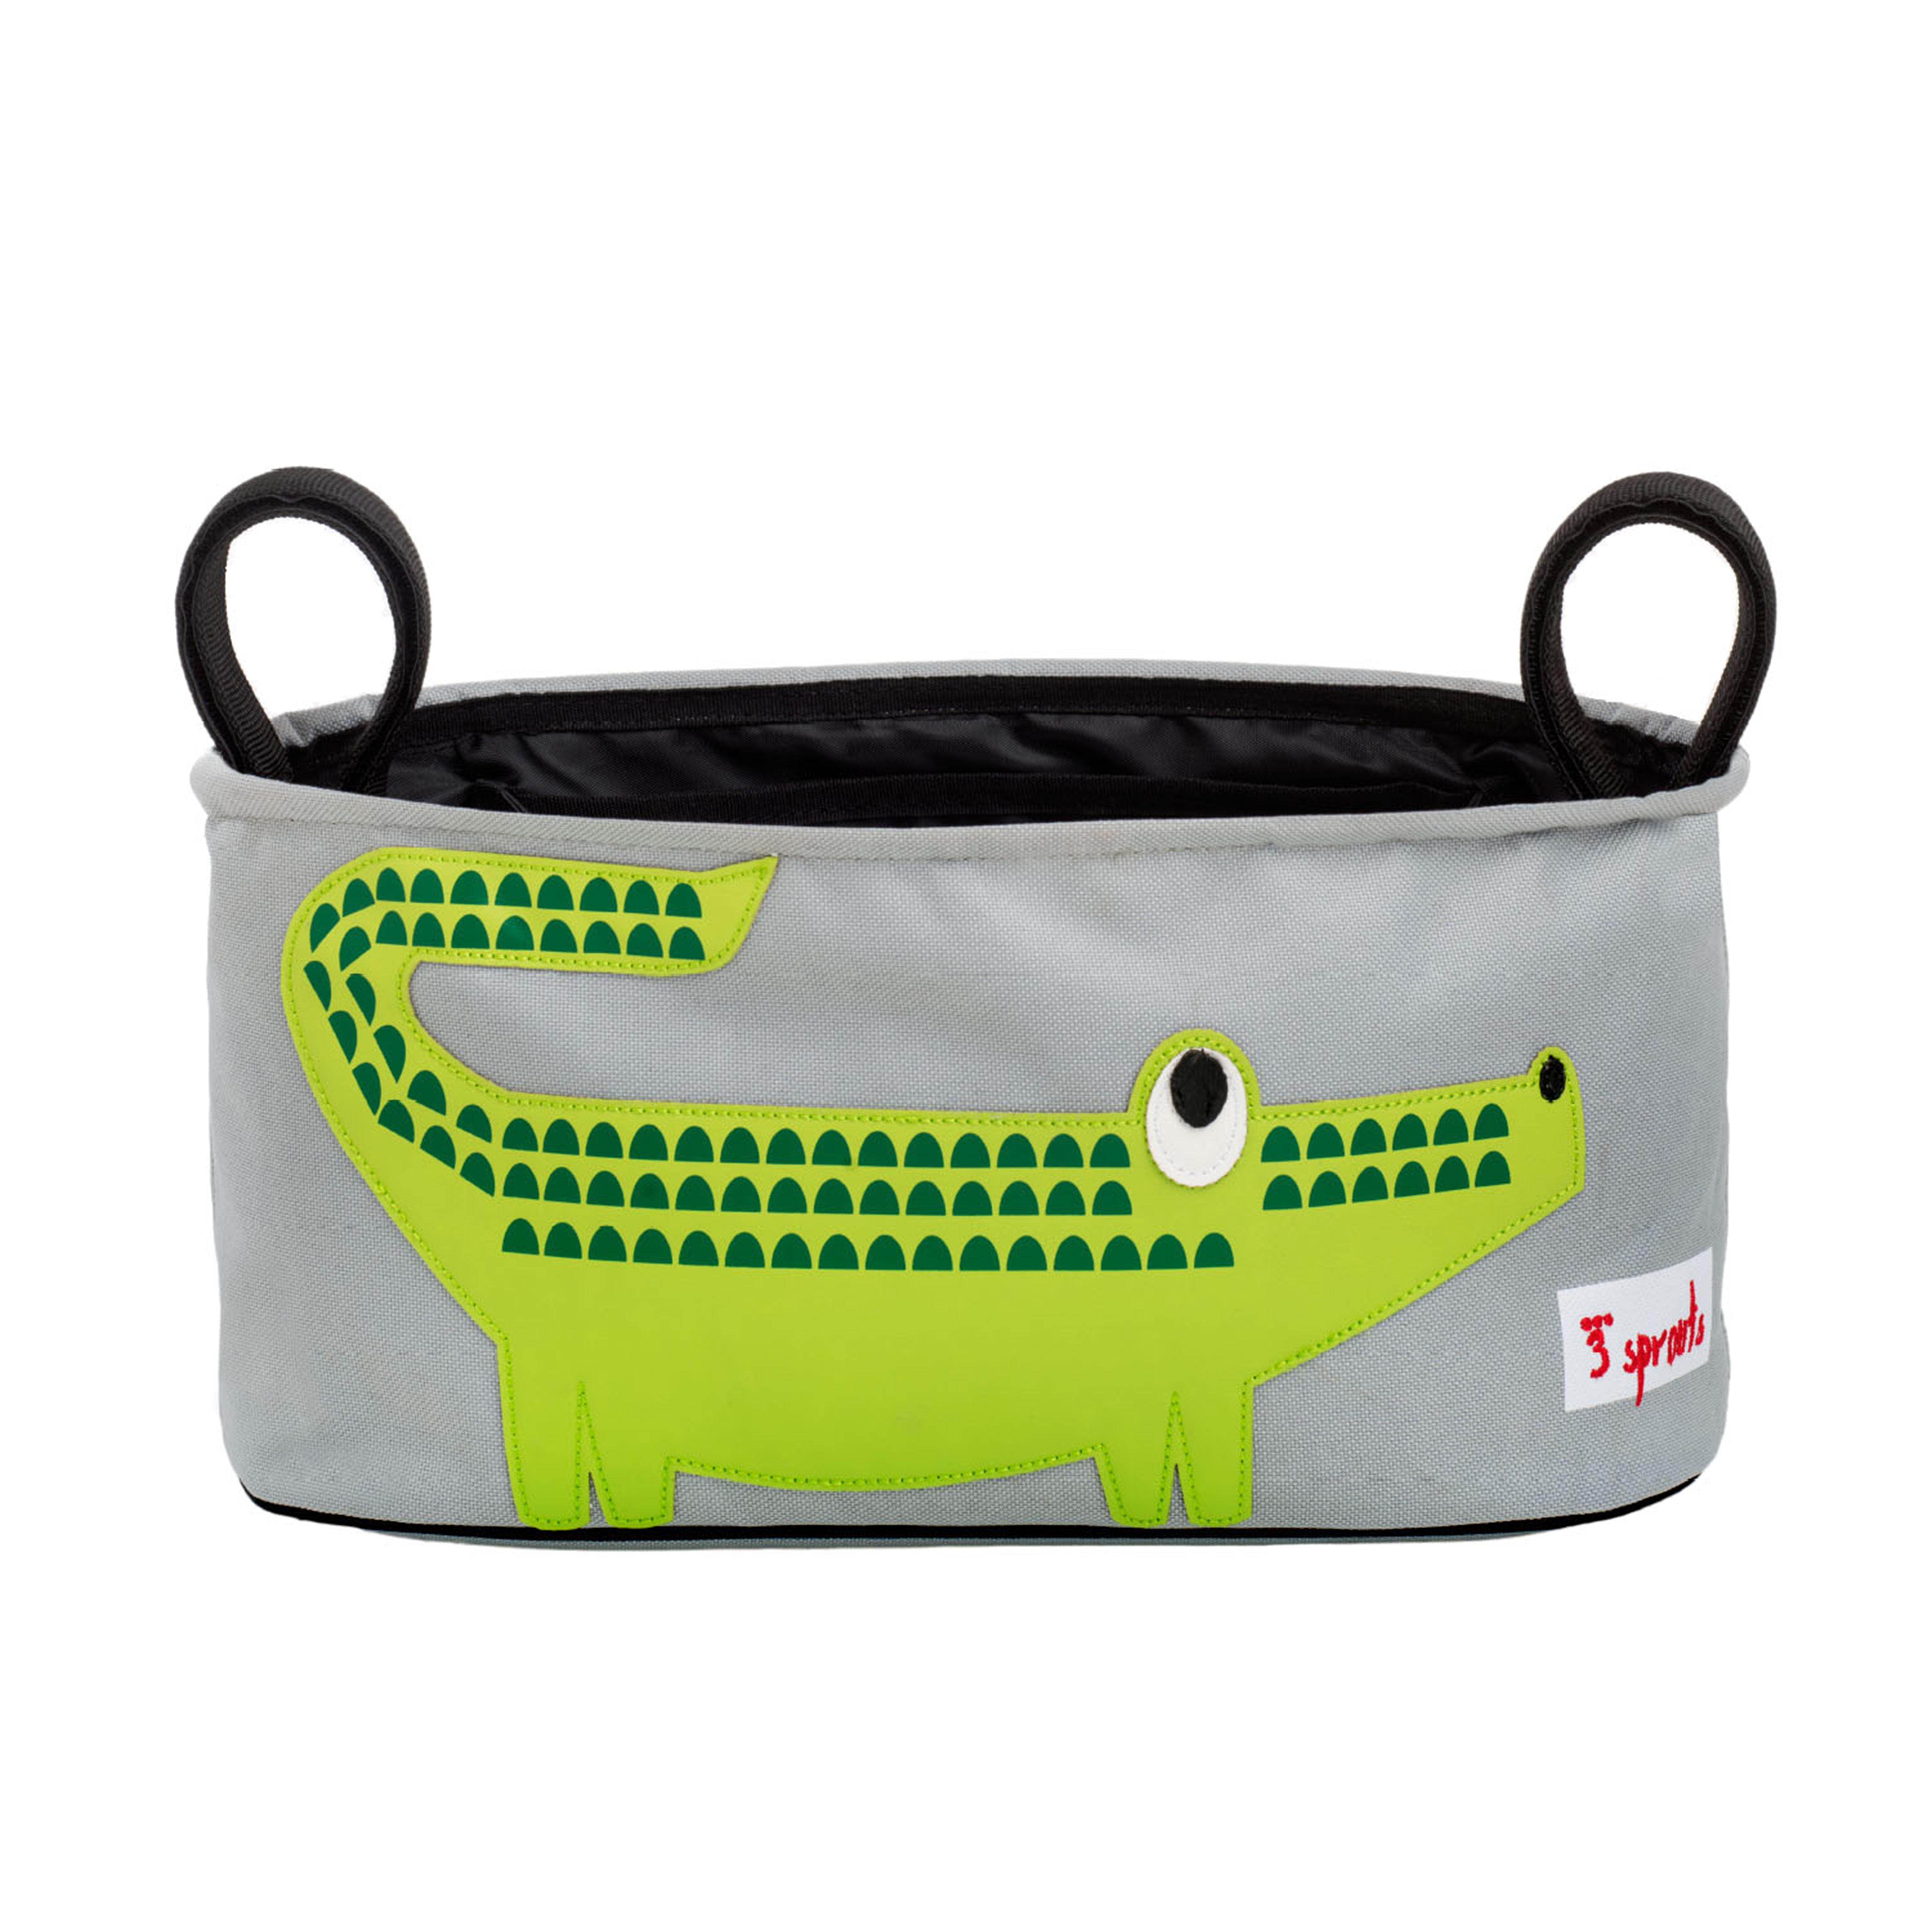 3 Sprouts - Stroller Organizer - Green Crocodile